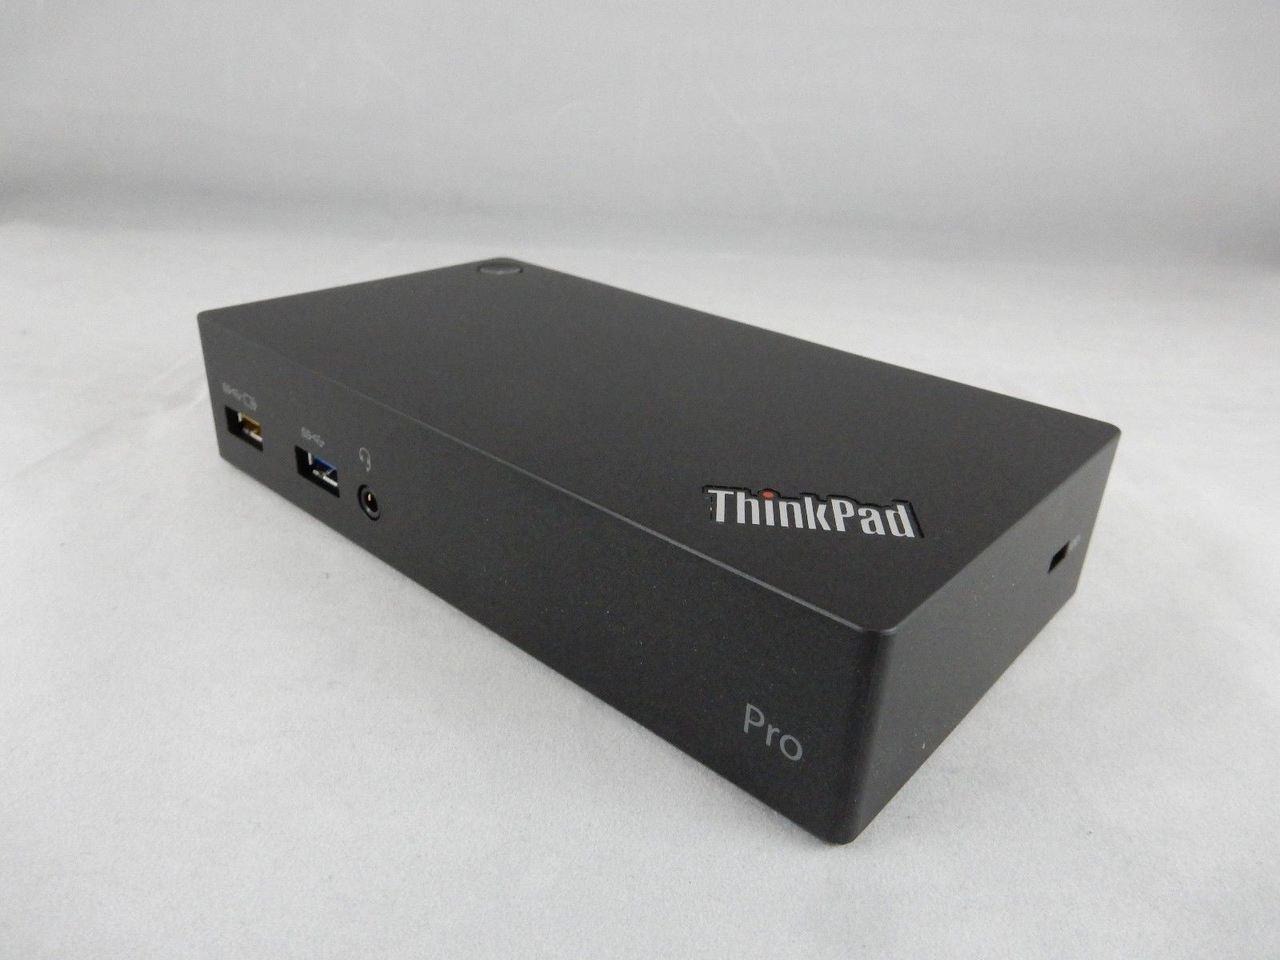 thinkpad usb 3 0 pro dock